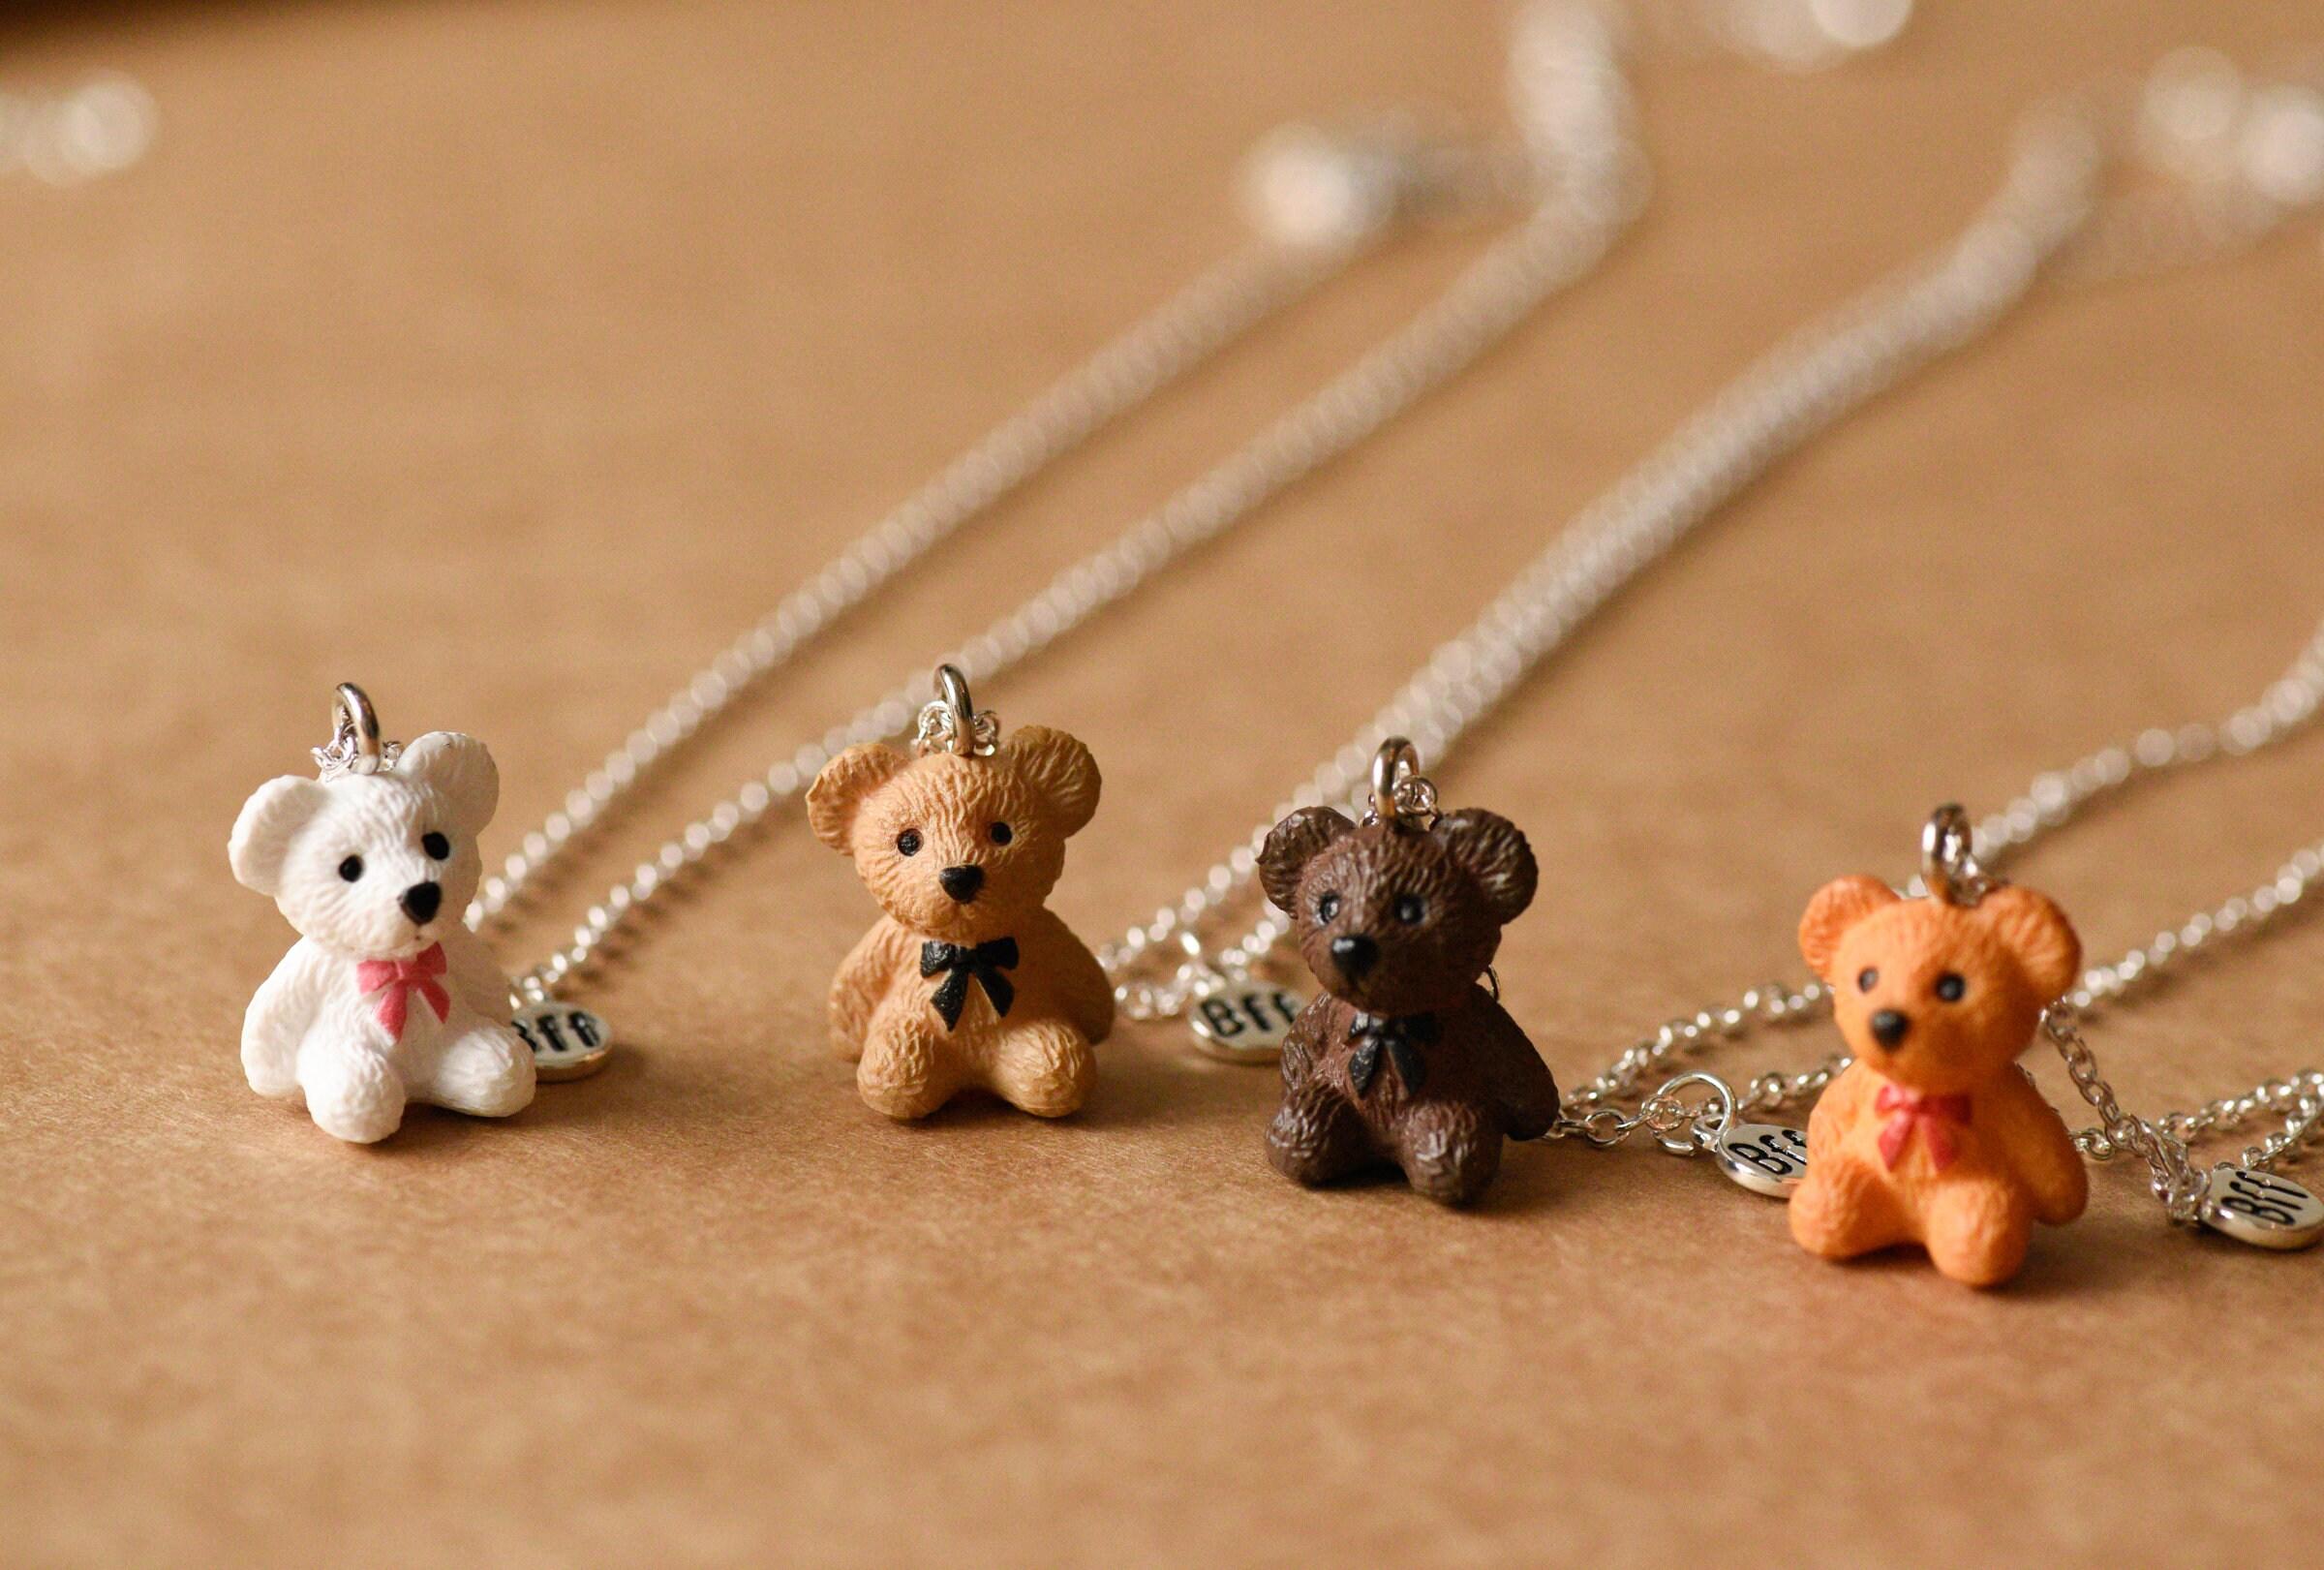 Super Cute 3D Teddy Bear BFF Necklace Best Friend Necklace